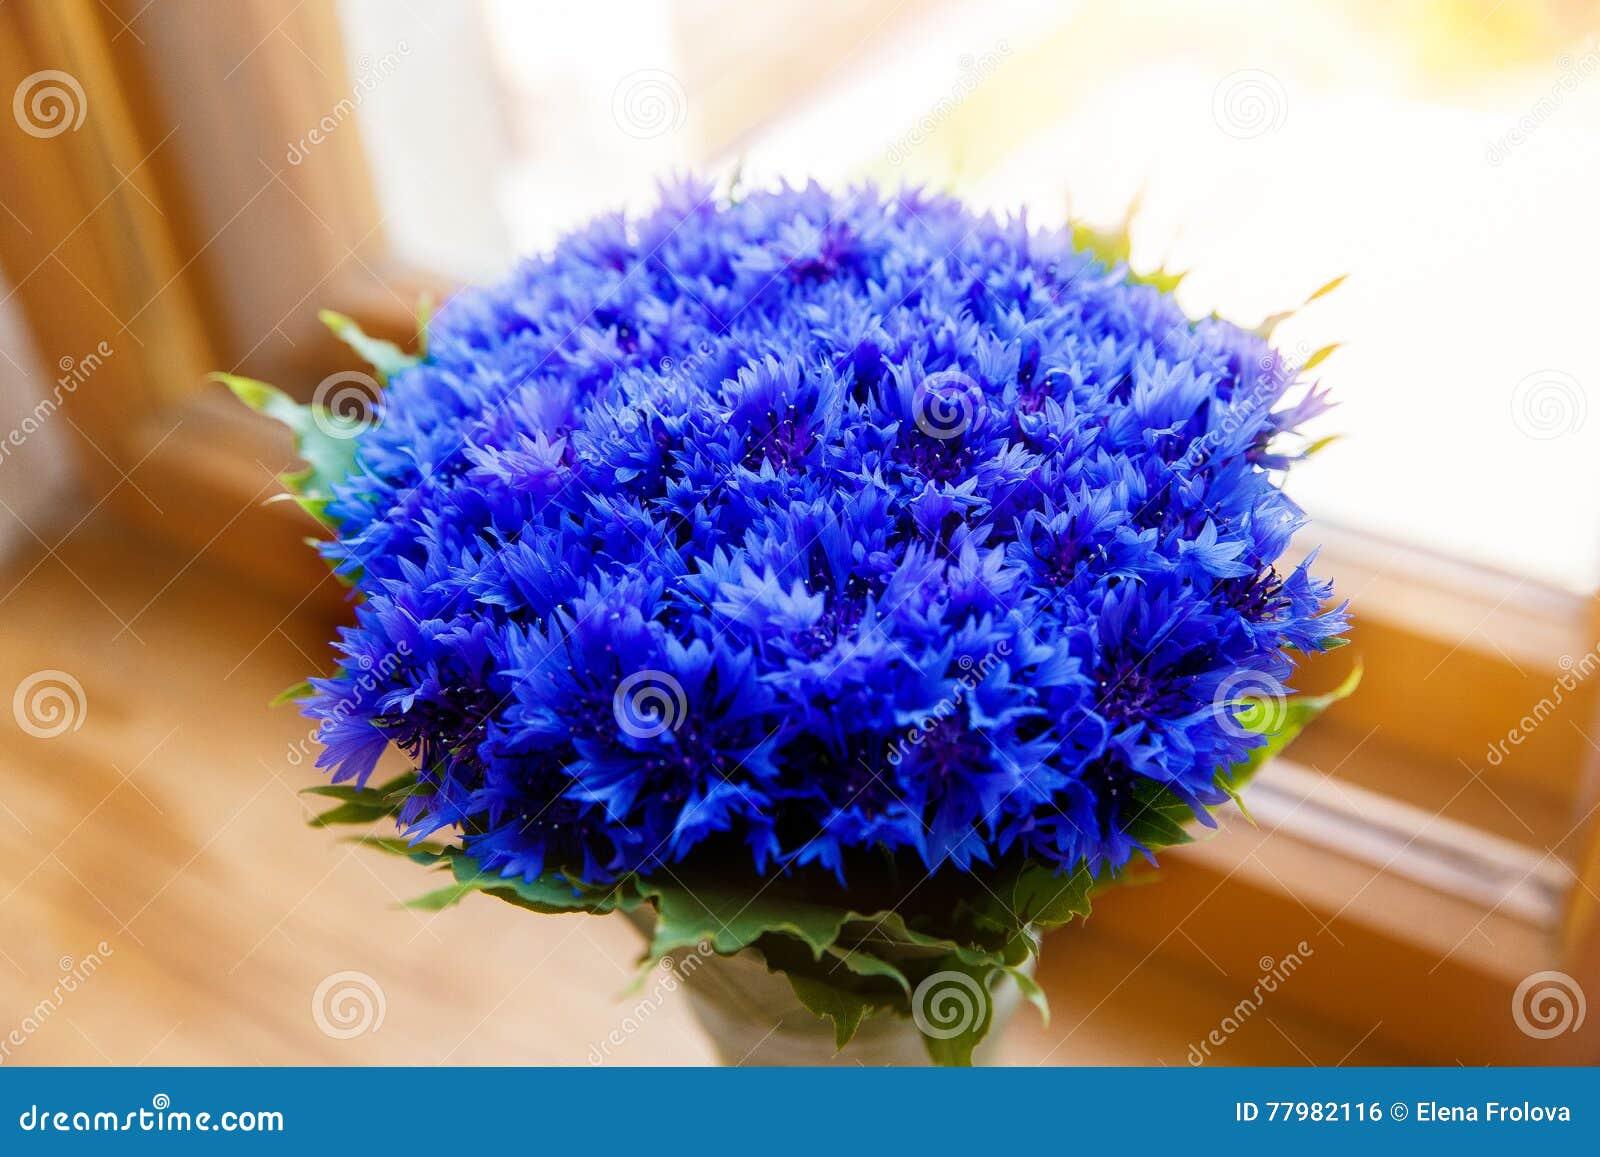 A Bouquet Of Beautiful Spring Flowers Blue Cornflower Cyanus On